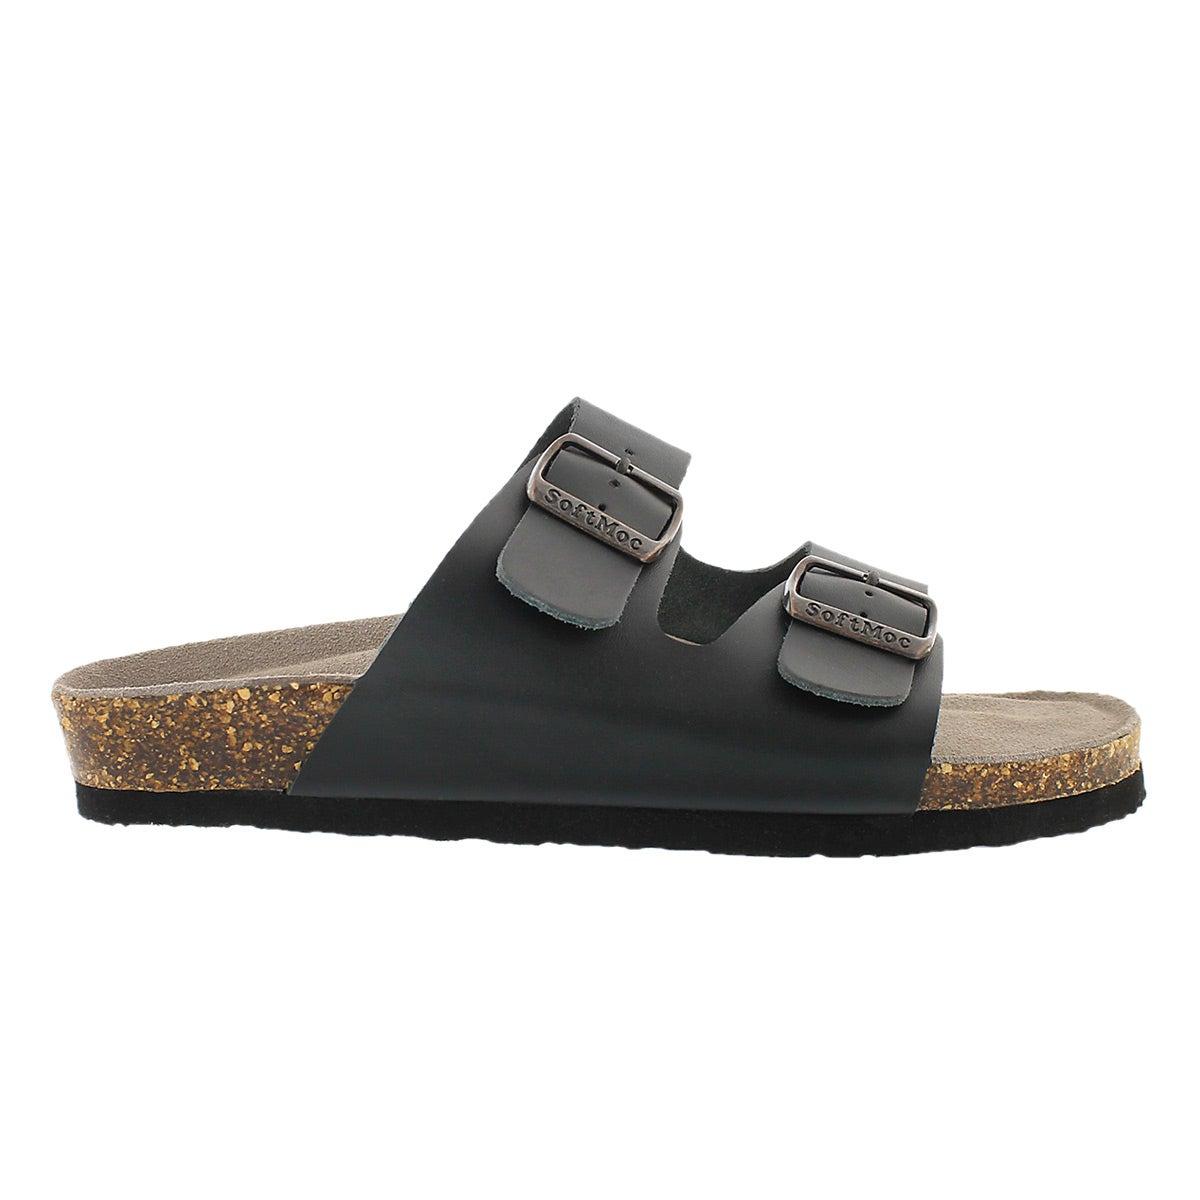 Mns Randy 3 blk memory foam slide sandal